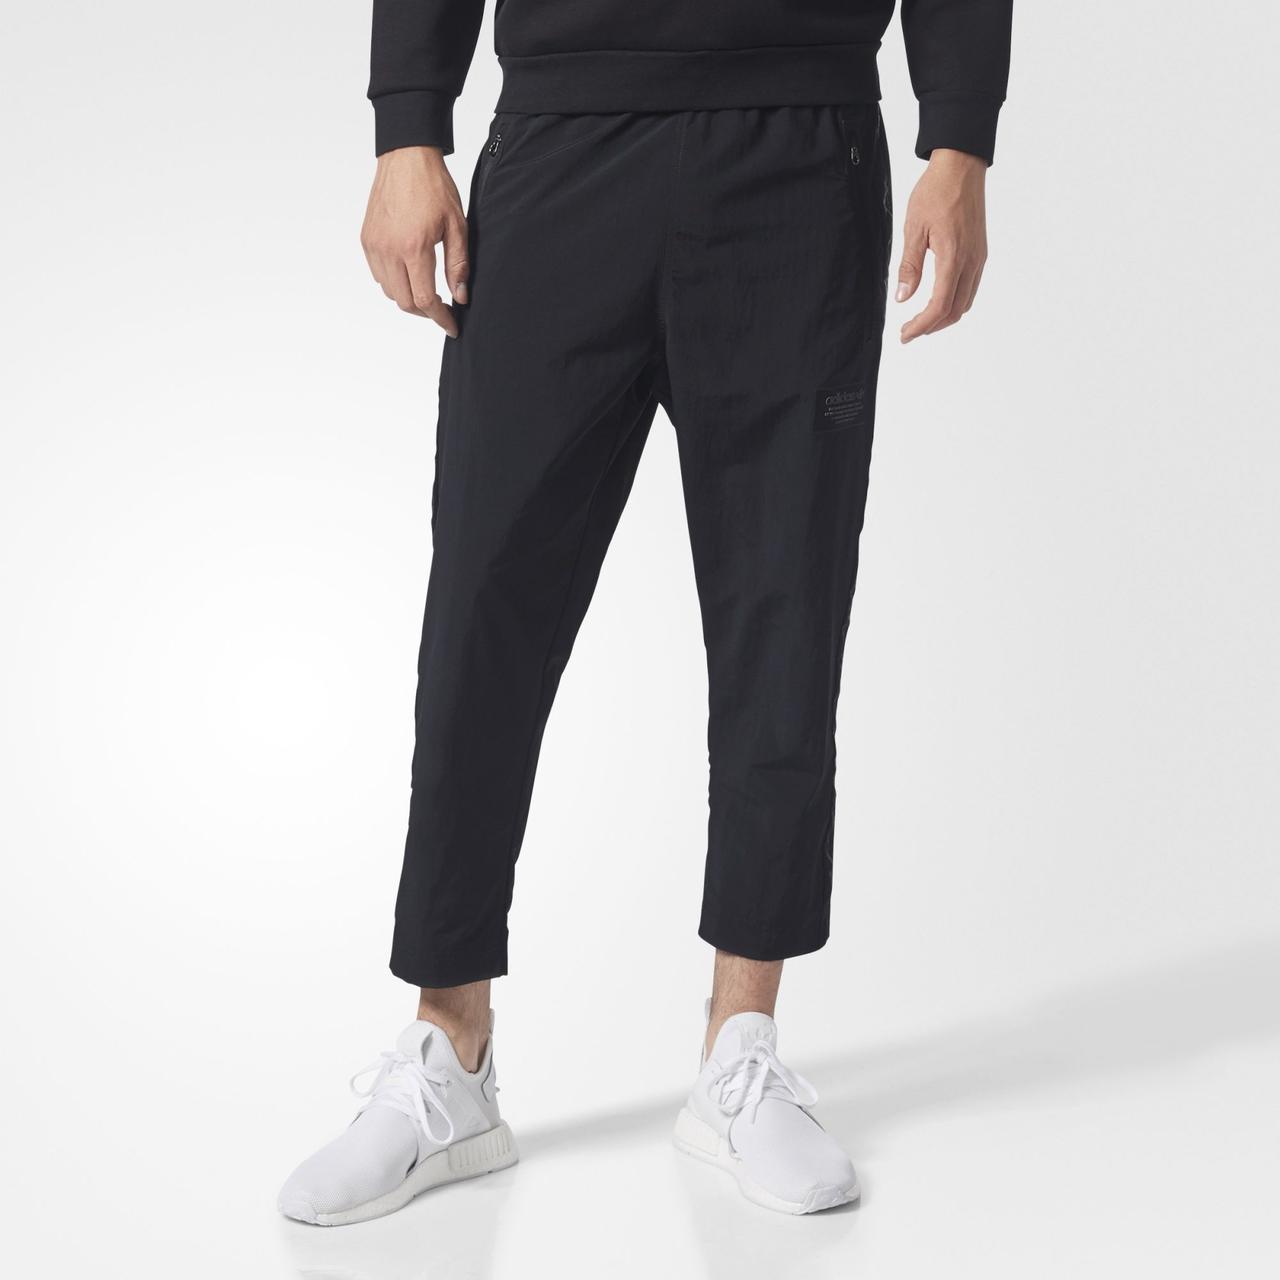 Мужские брюки Adidas Originals NMD (Артикул  BS2587) - Интернет-магазин  «Эксперт c8a9d526632